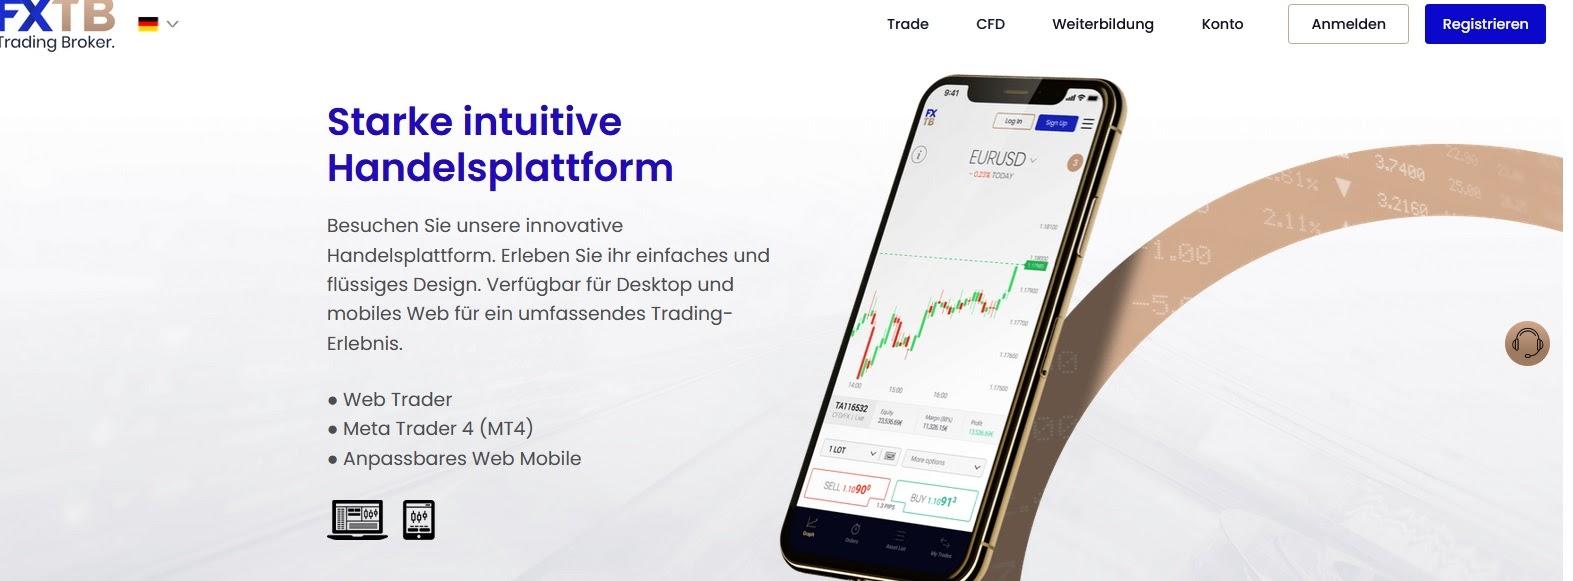 FXTB Trading Plattform kurz erklärt